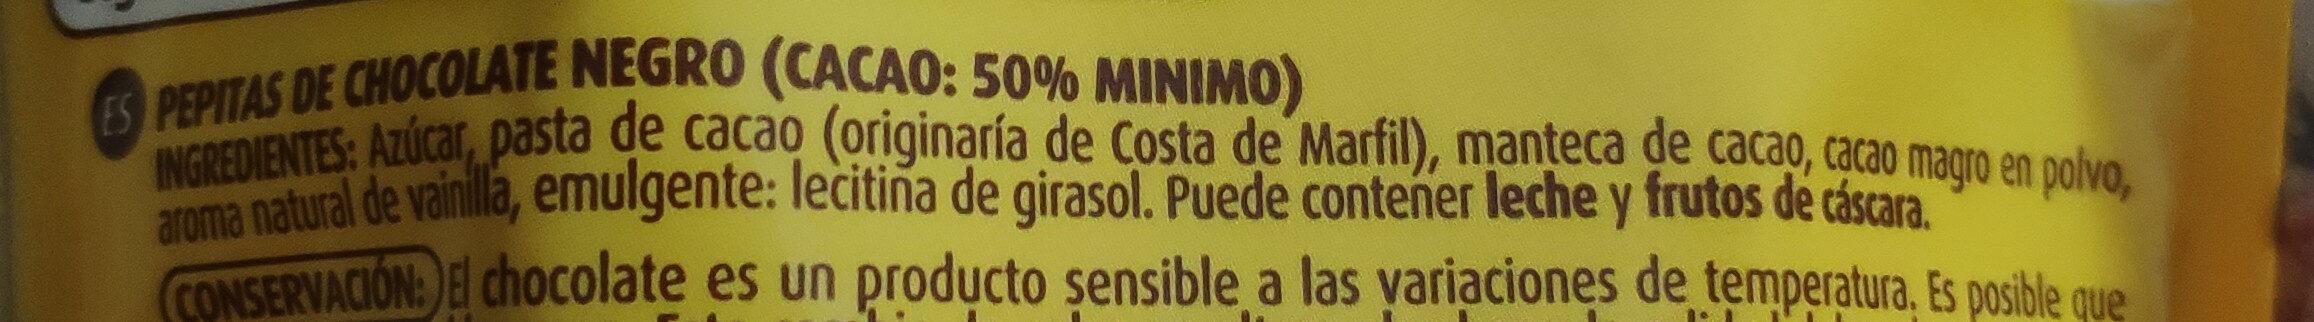 Pepitas de chocolate negro - Ingredients - es